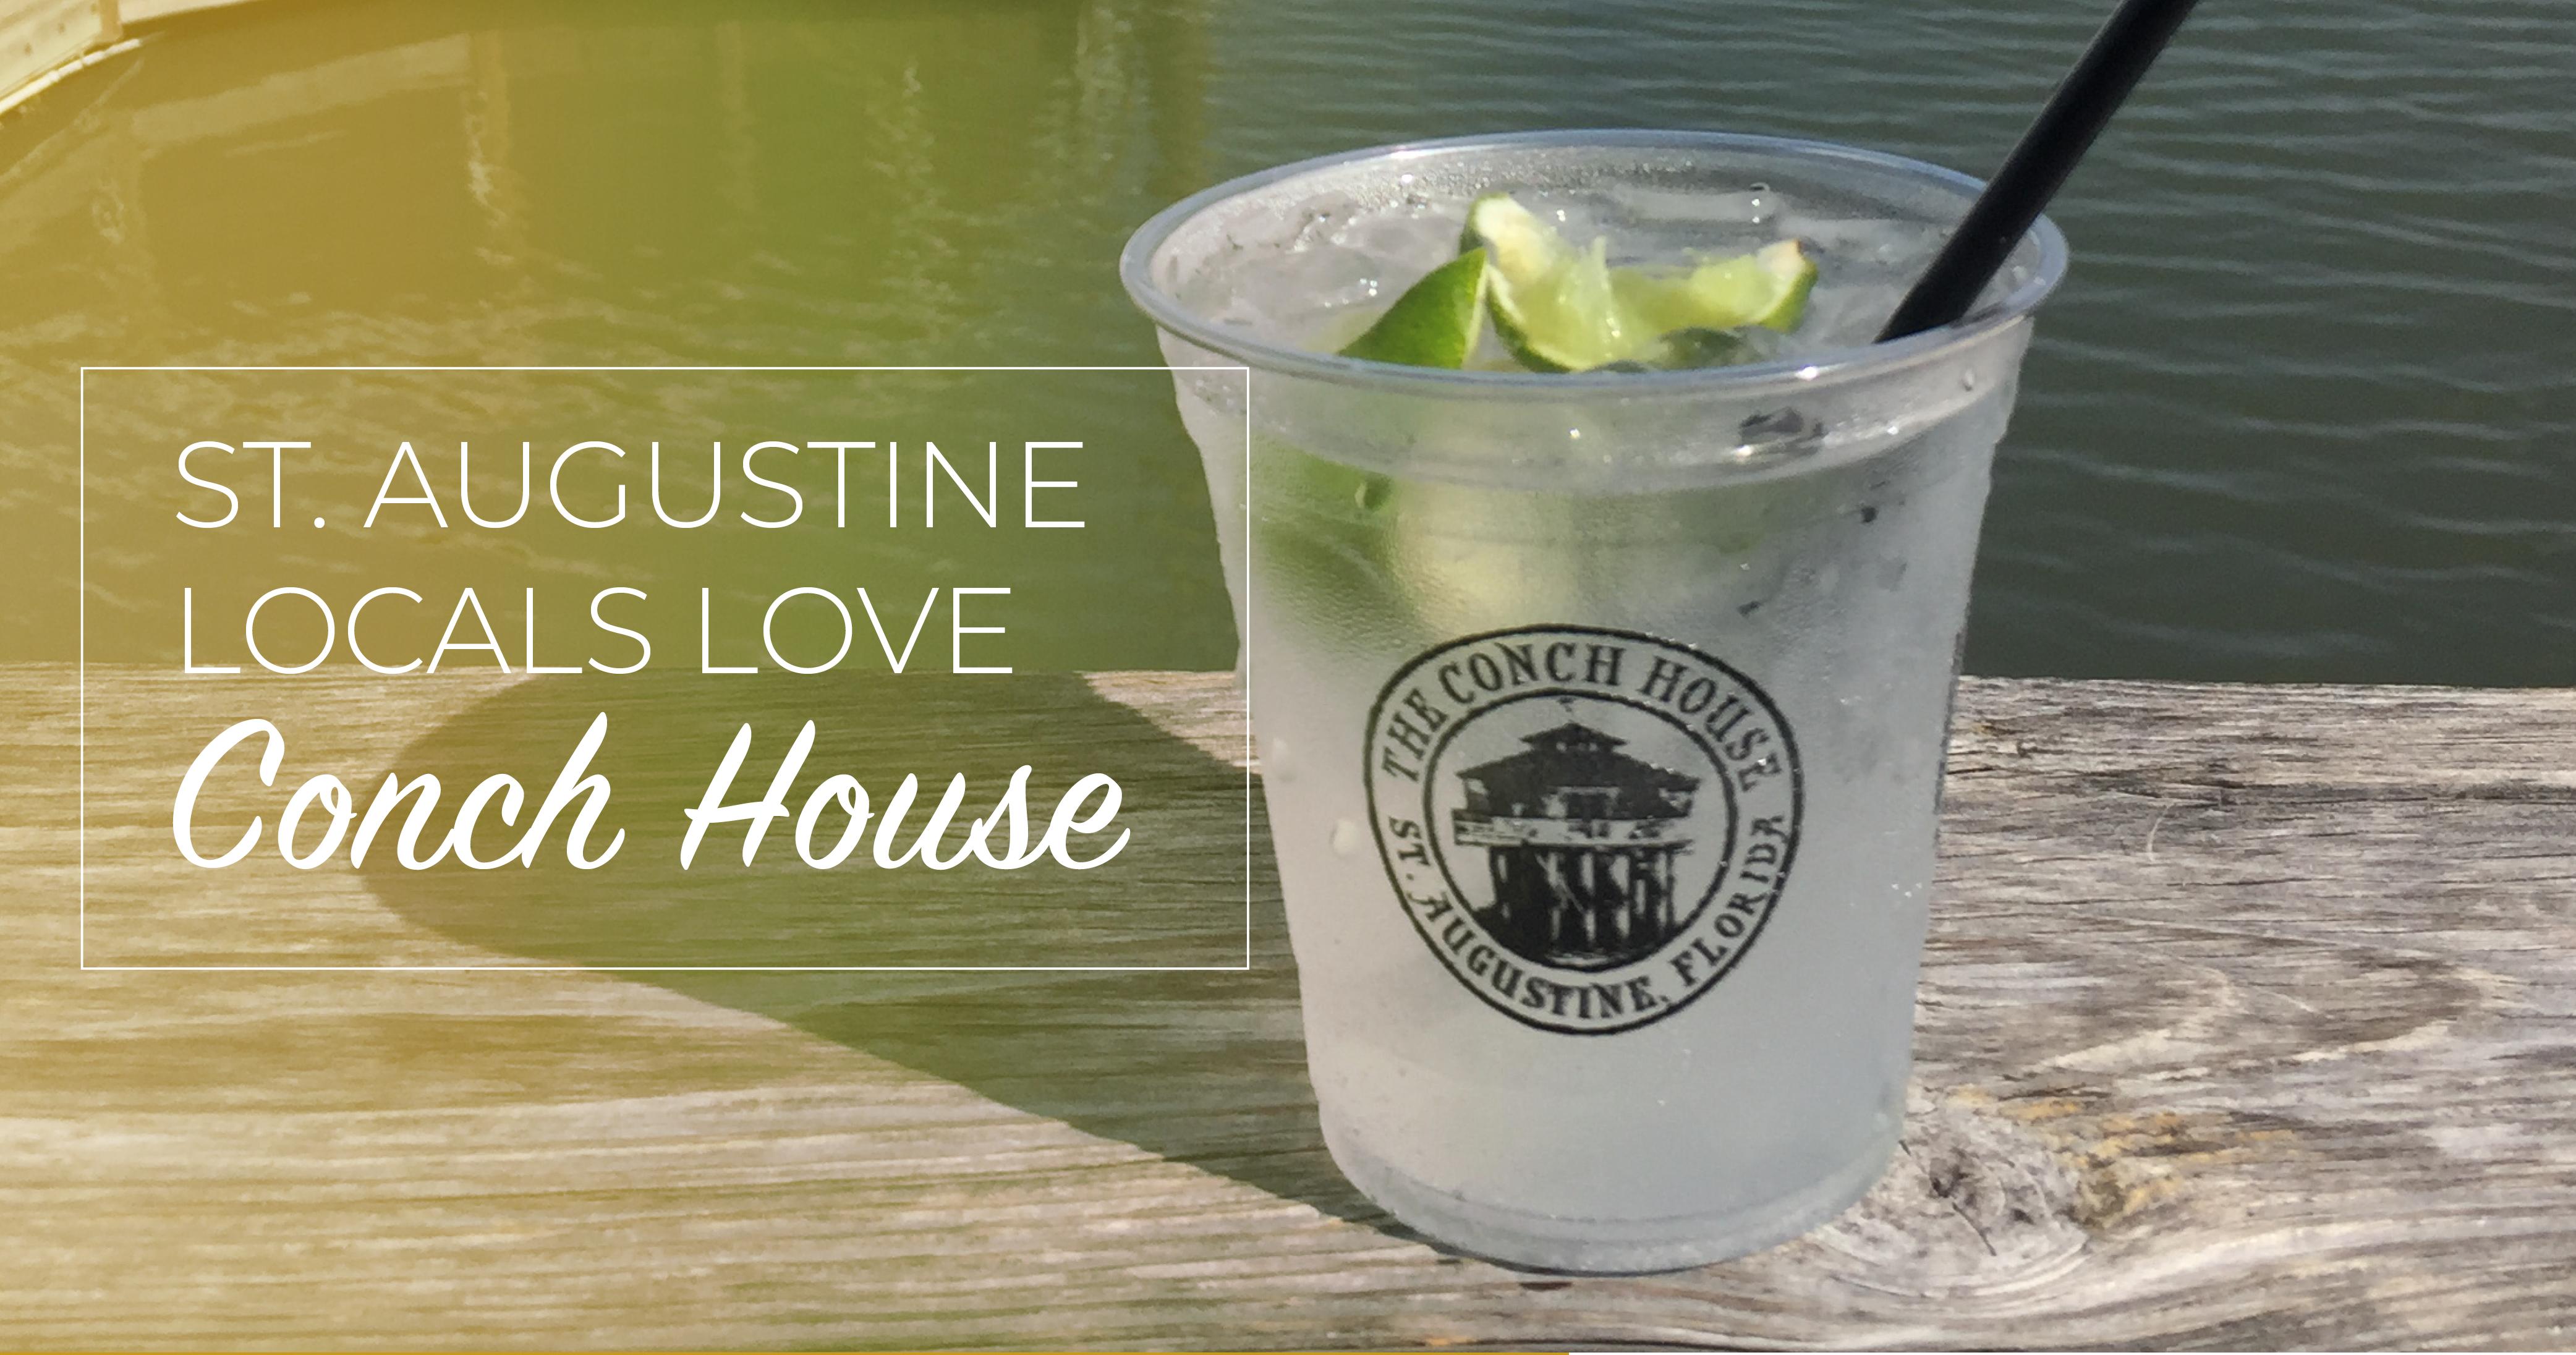 St. Augustine Locals Love: Conch House